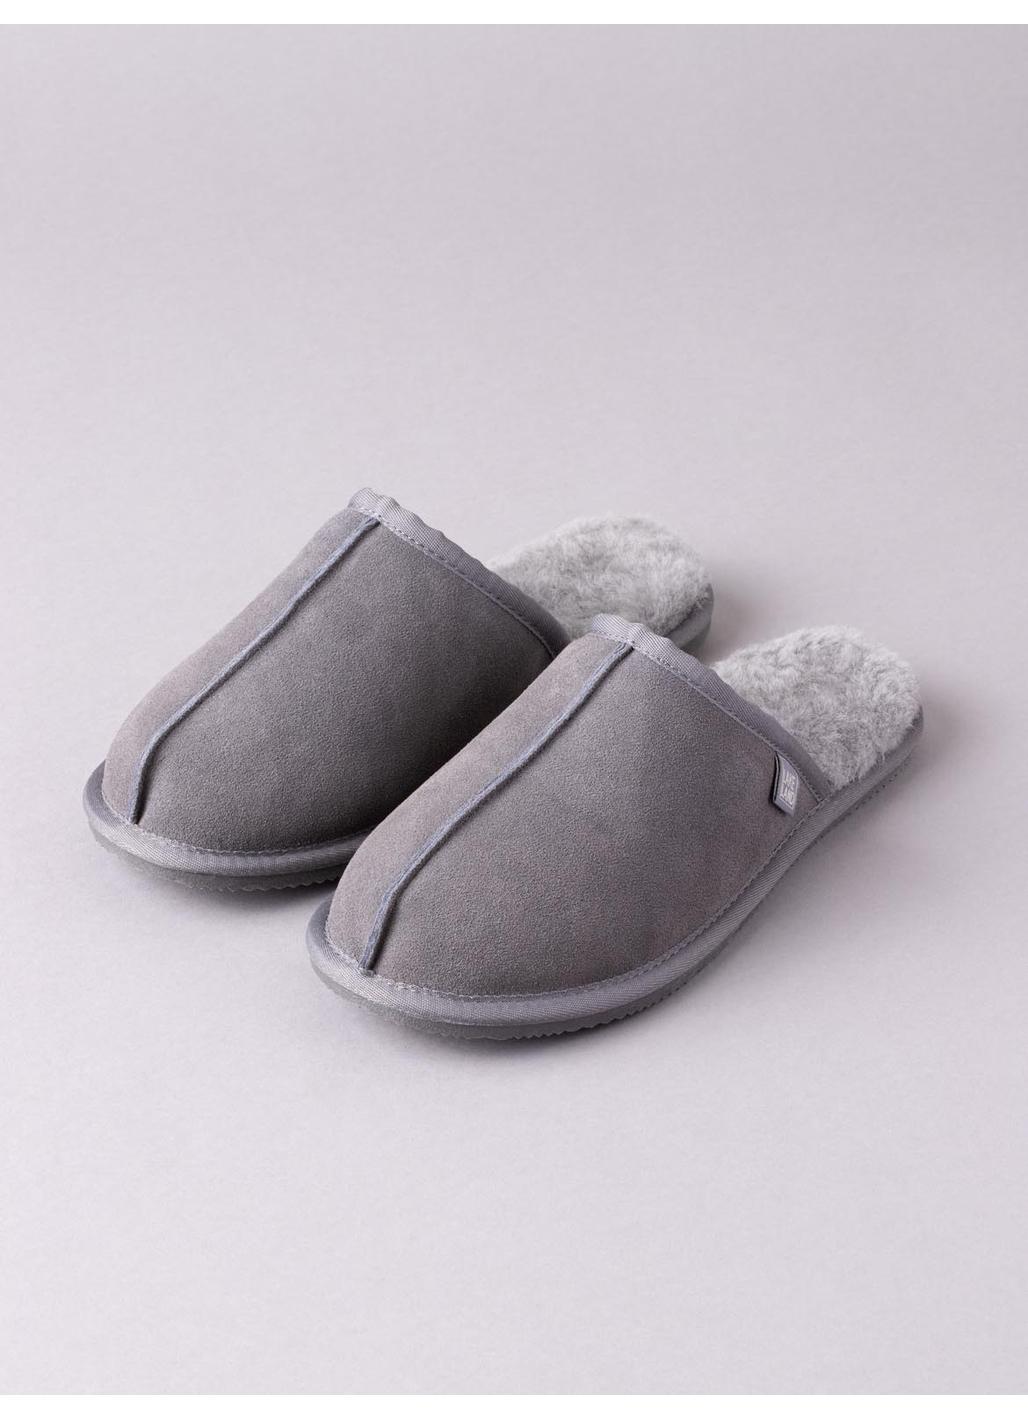 Men's Sheepskin Sliders in Grey